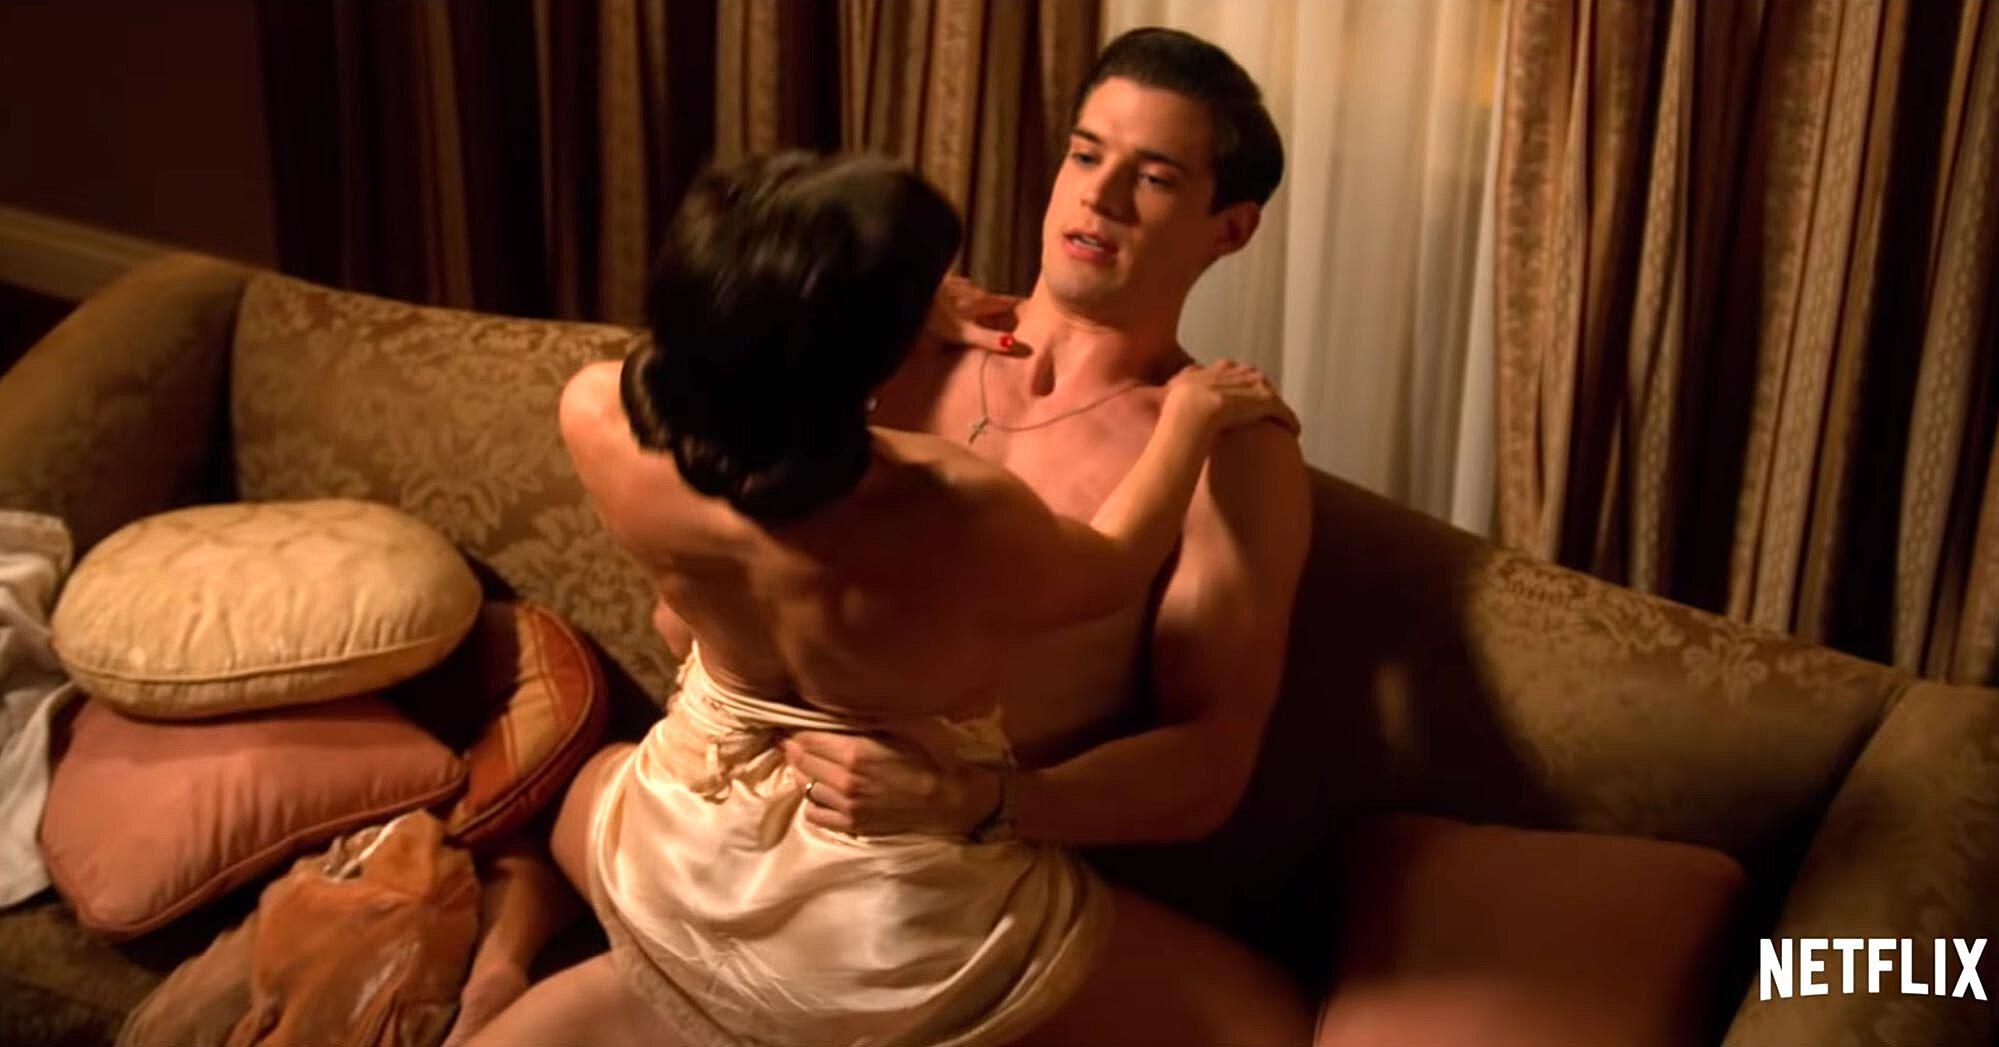 Love 2020 sex scene